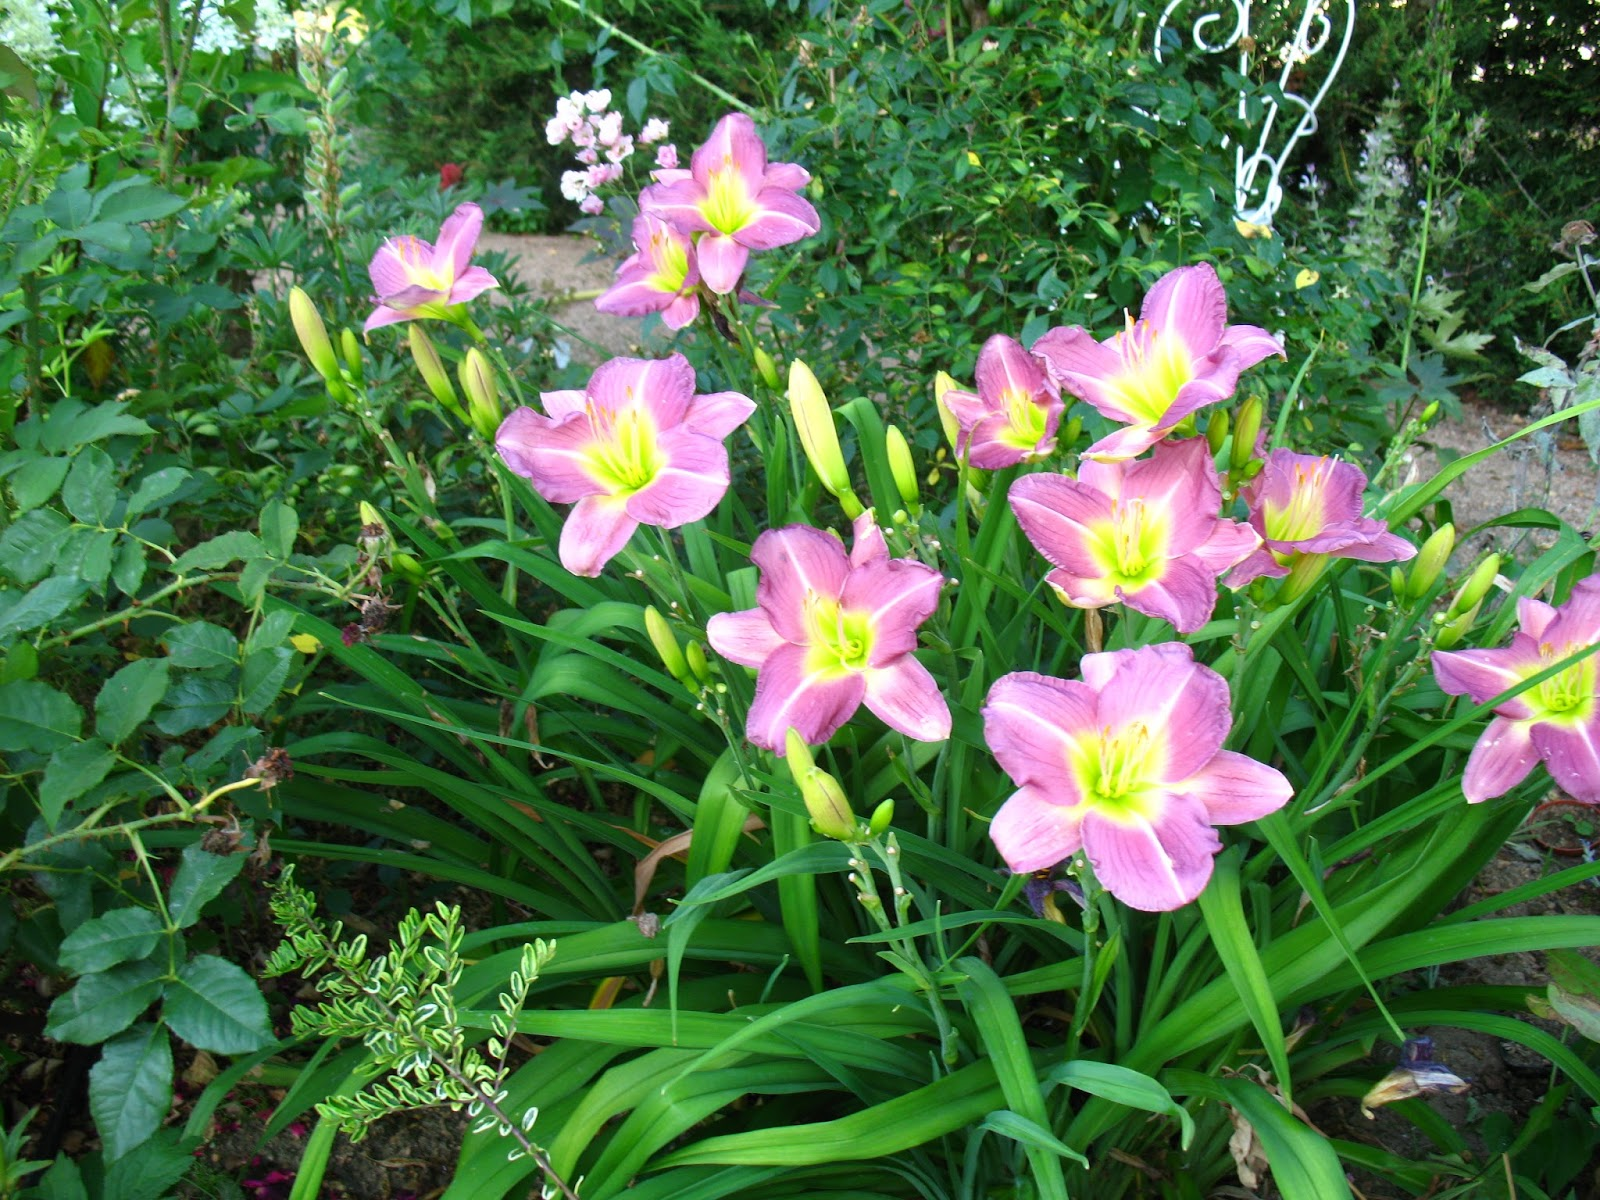 Roses du jardin ch neland h m rocalle m taphor for Plante 4 images 1 mot